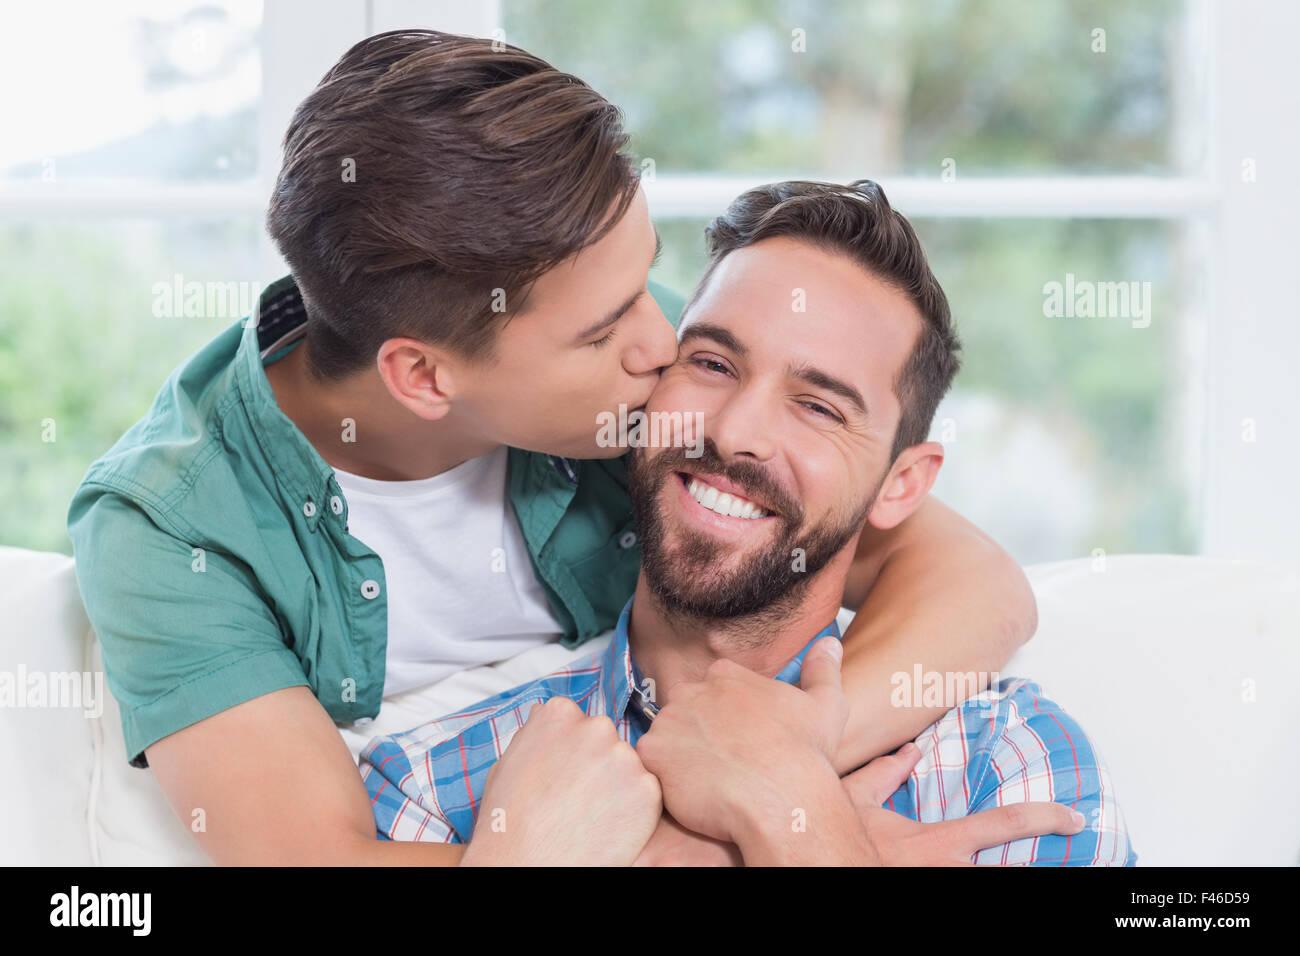 will patton gay hitman